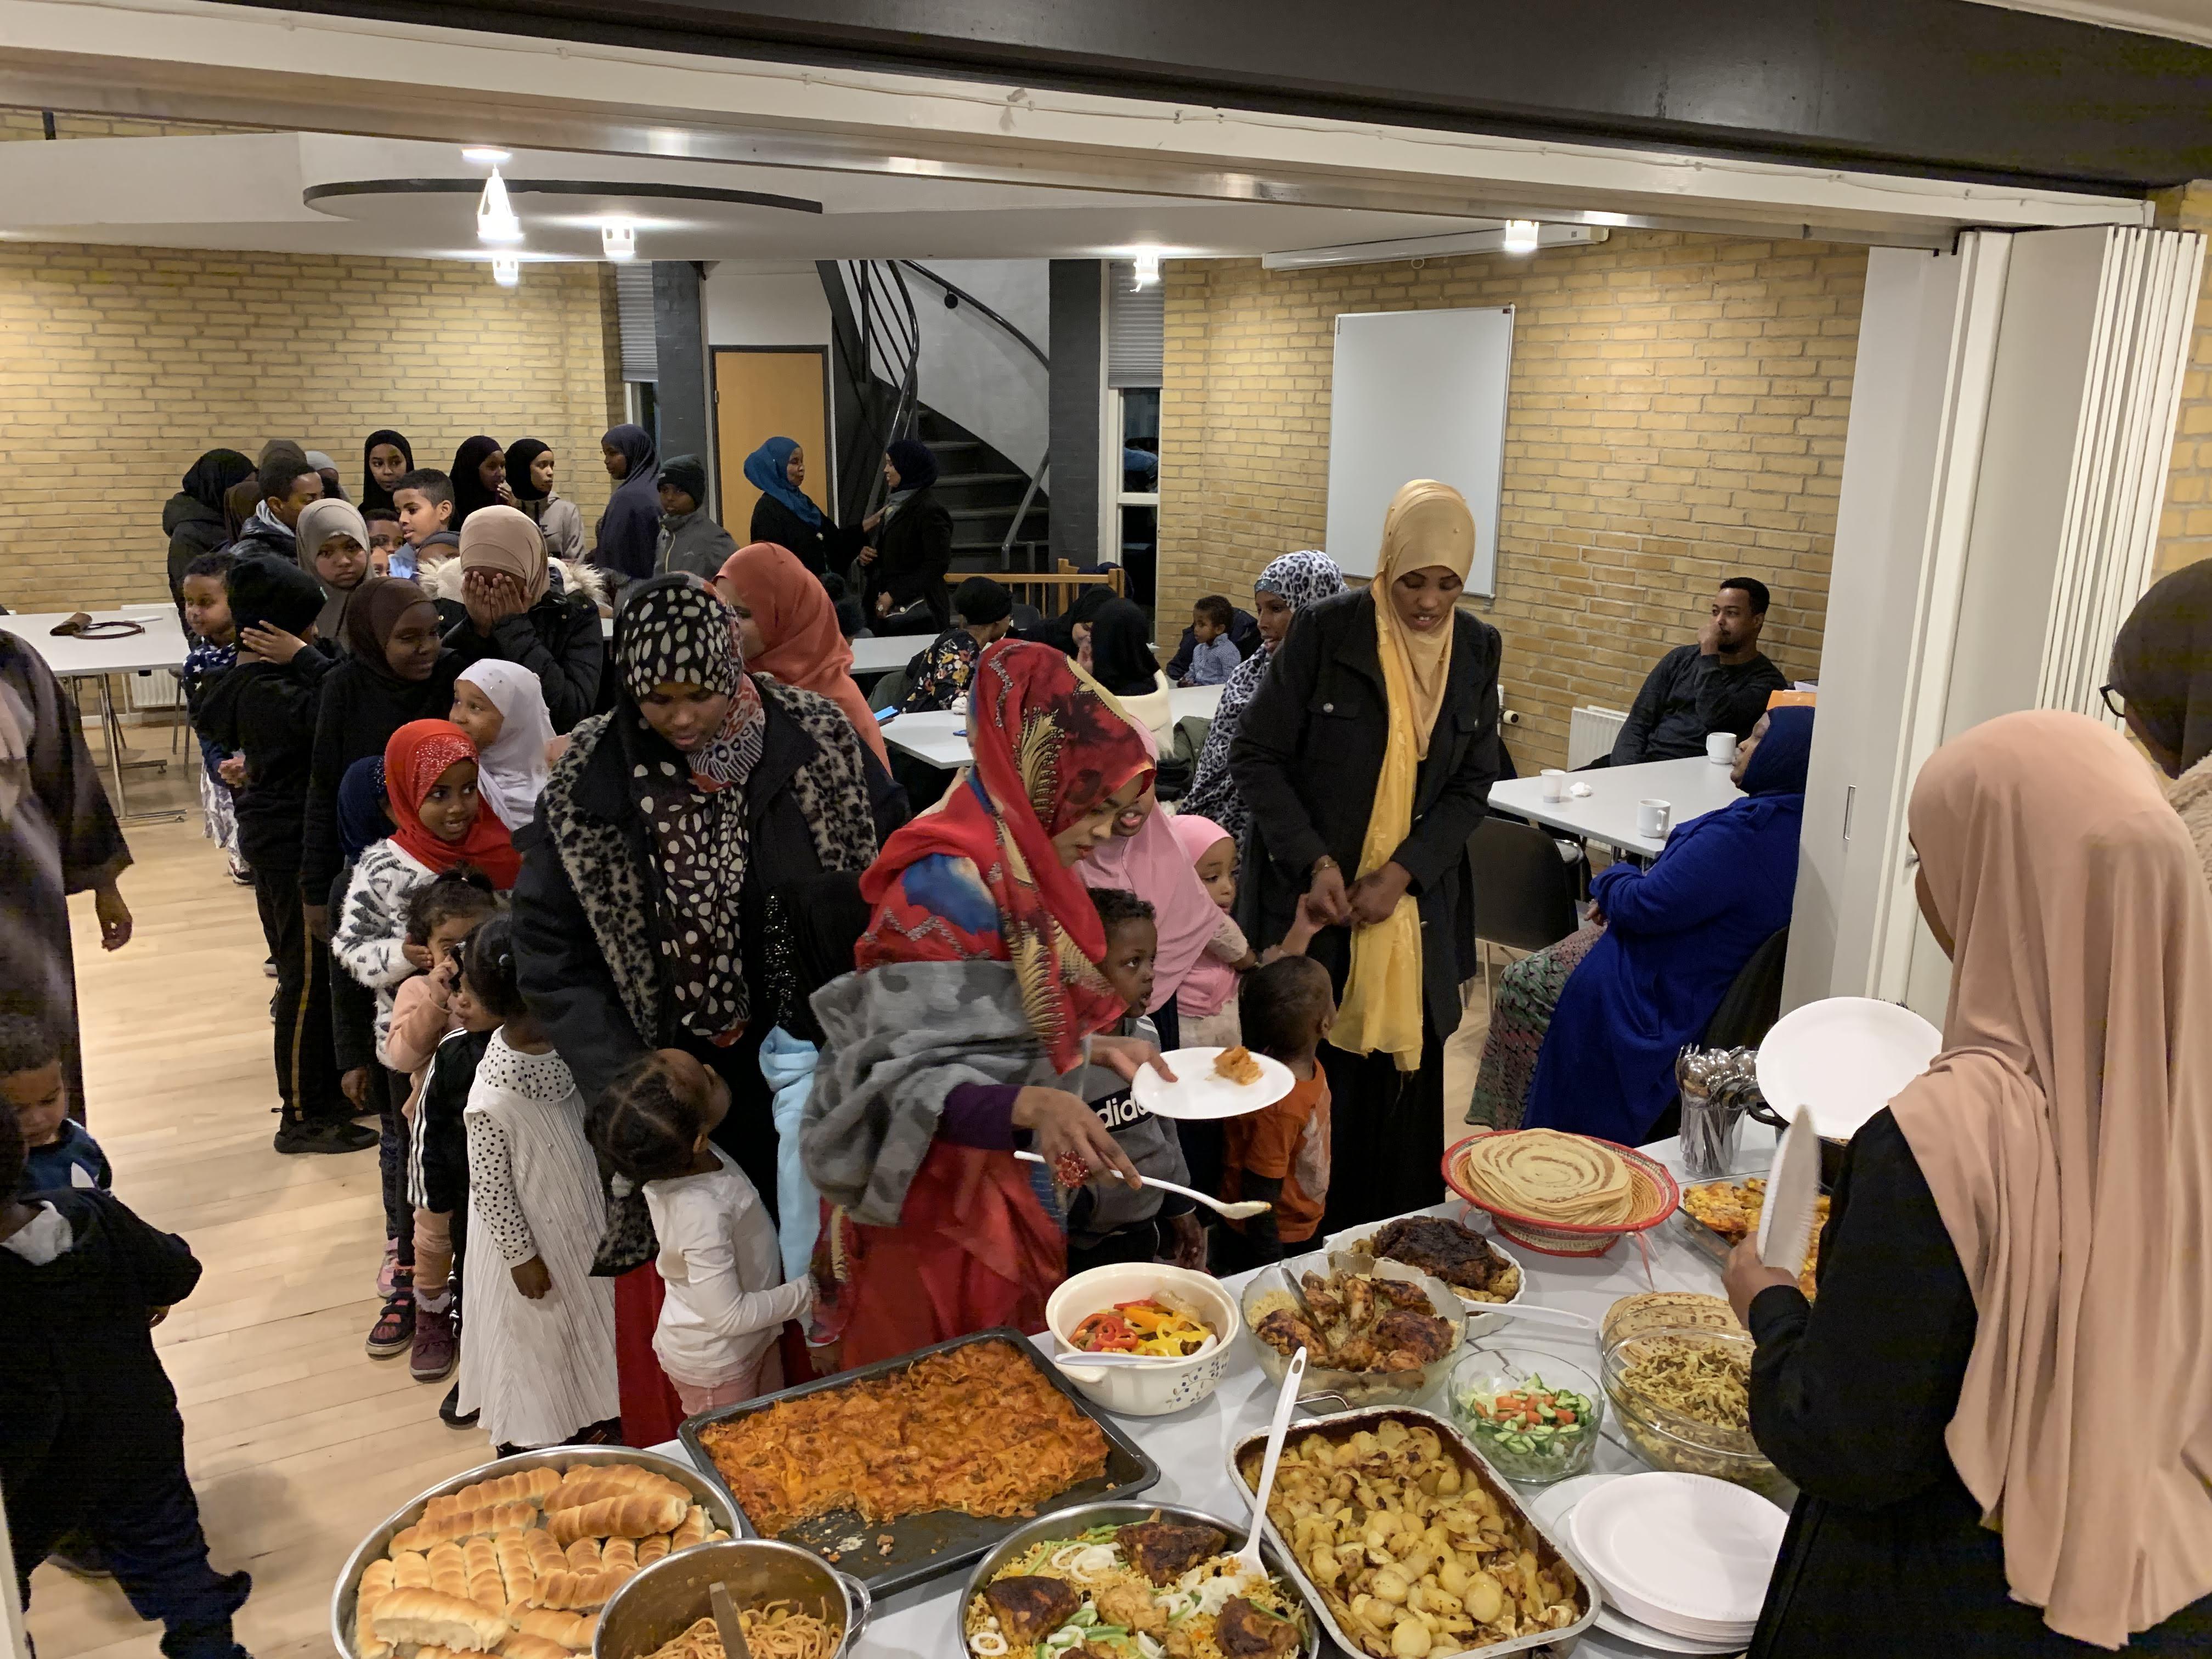 fællesspisning-den-28-12-2019-i-beboerhuset-på-Ellekonebakken-023